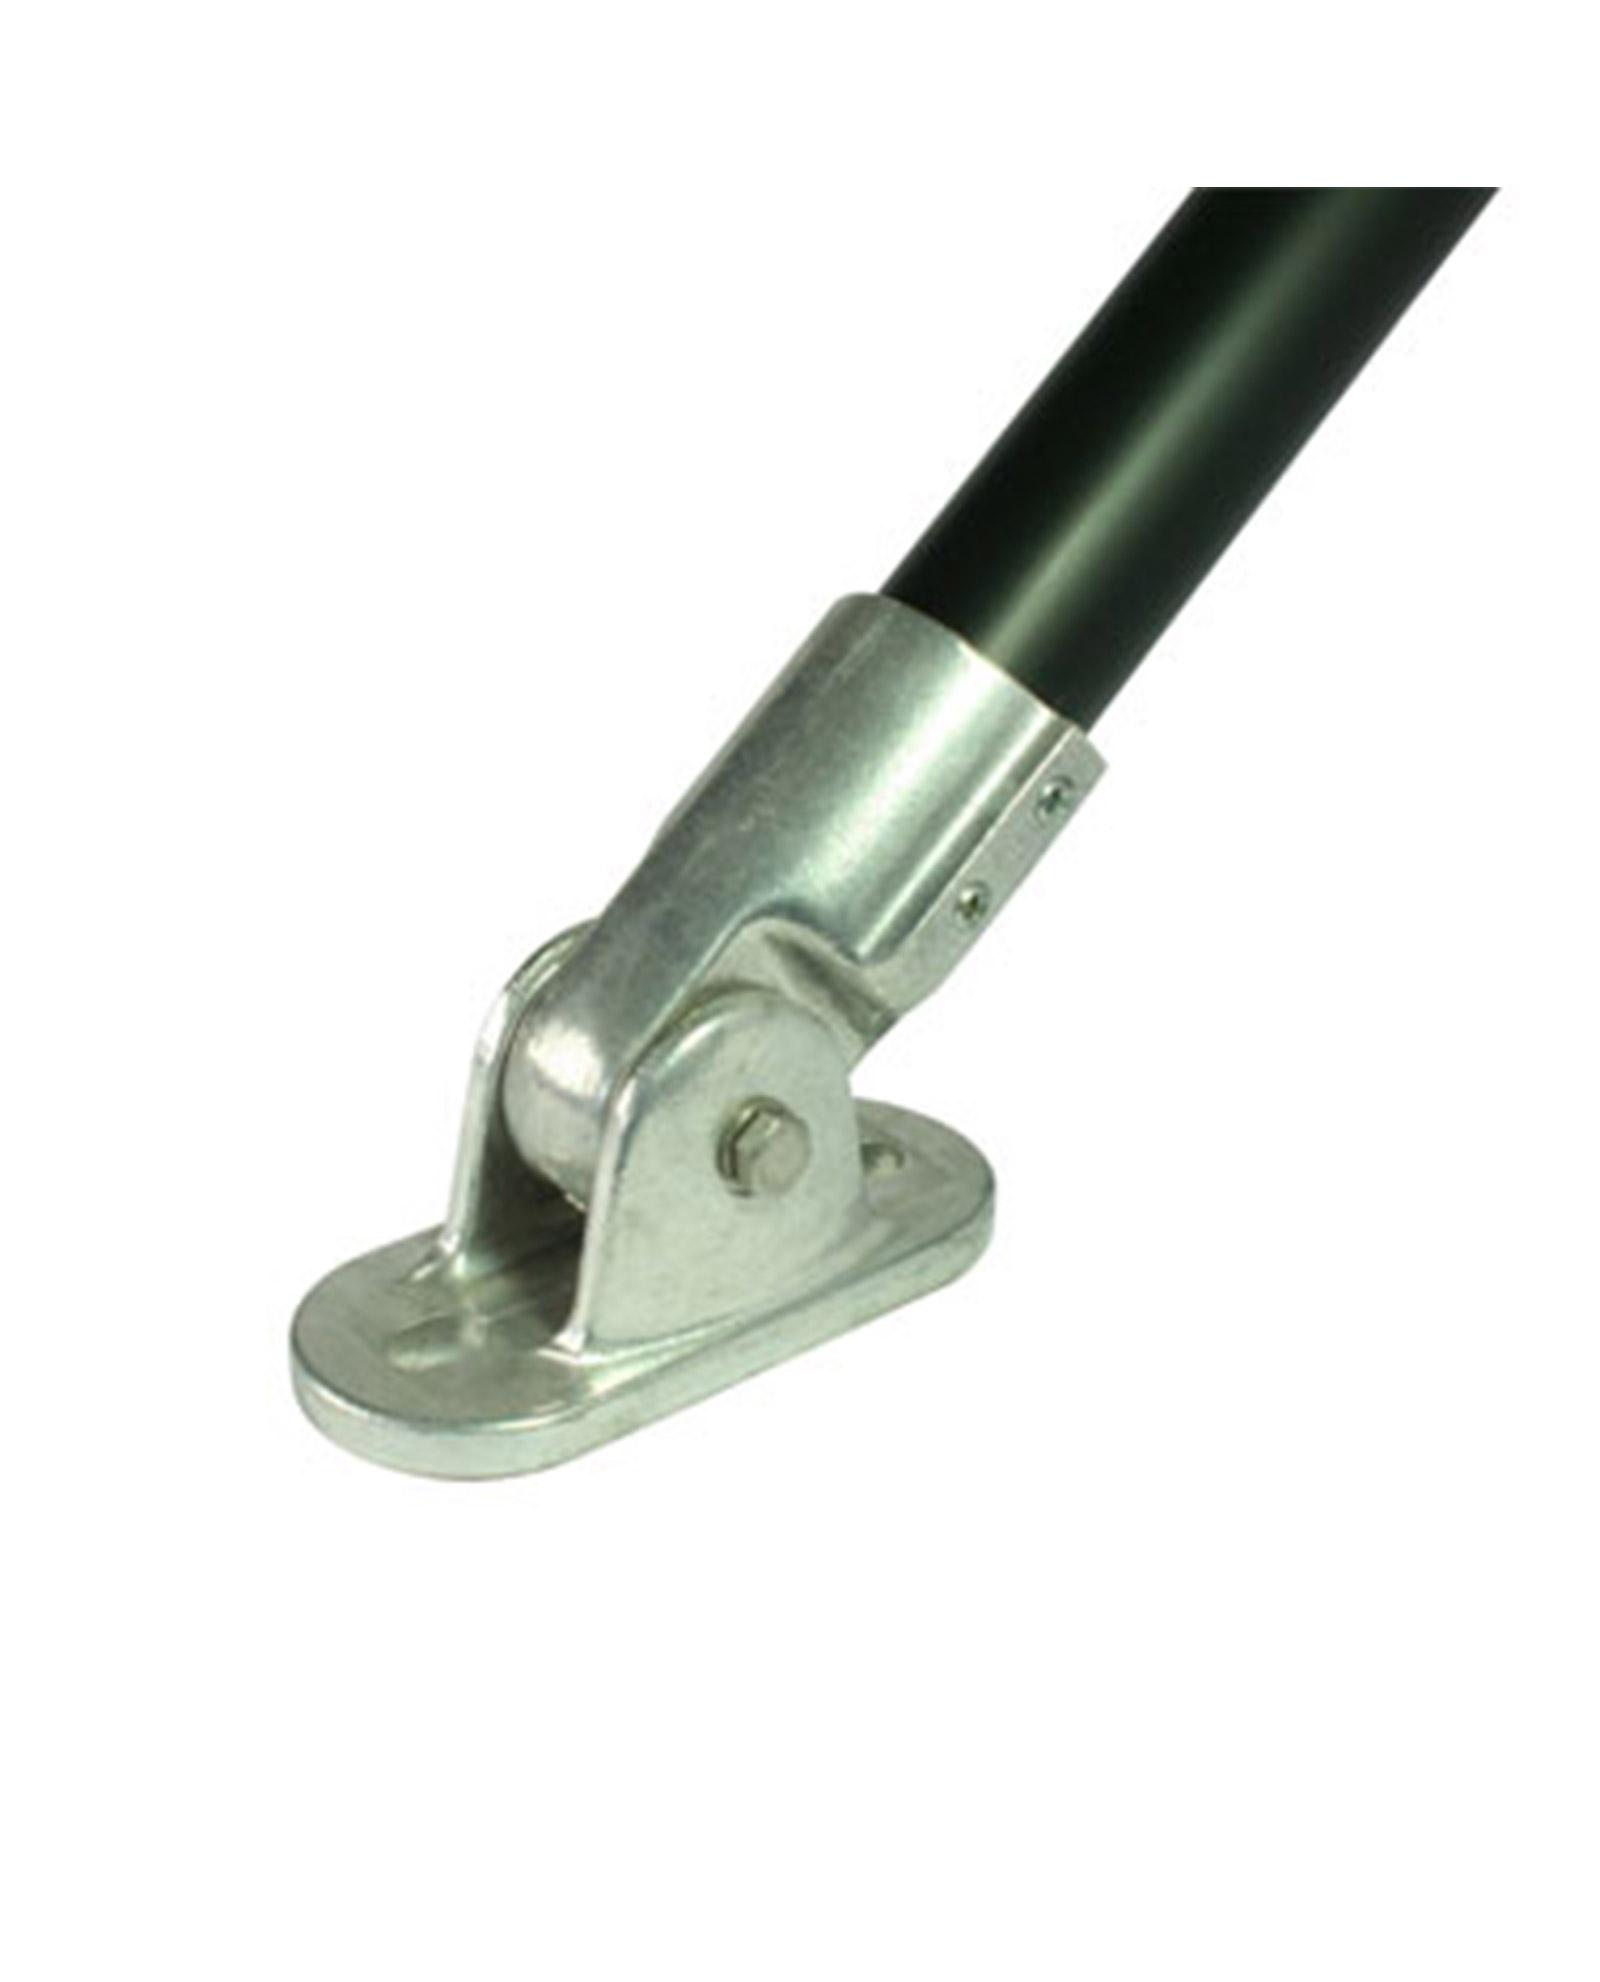 Doughtyspeedrail Adjustable Flange